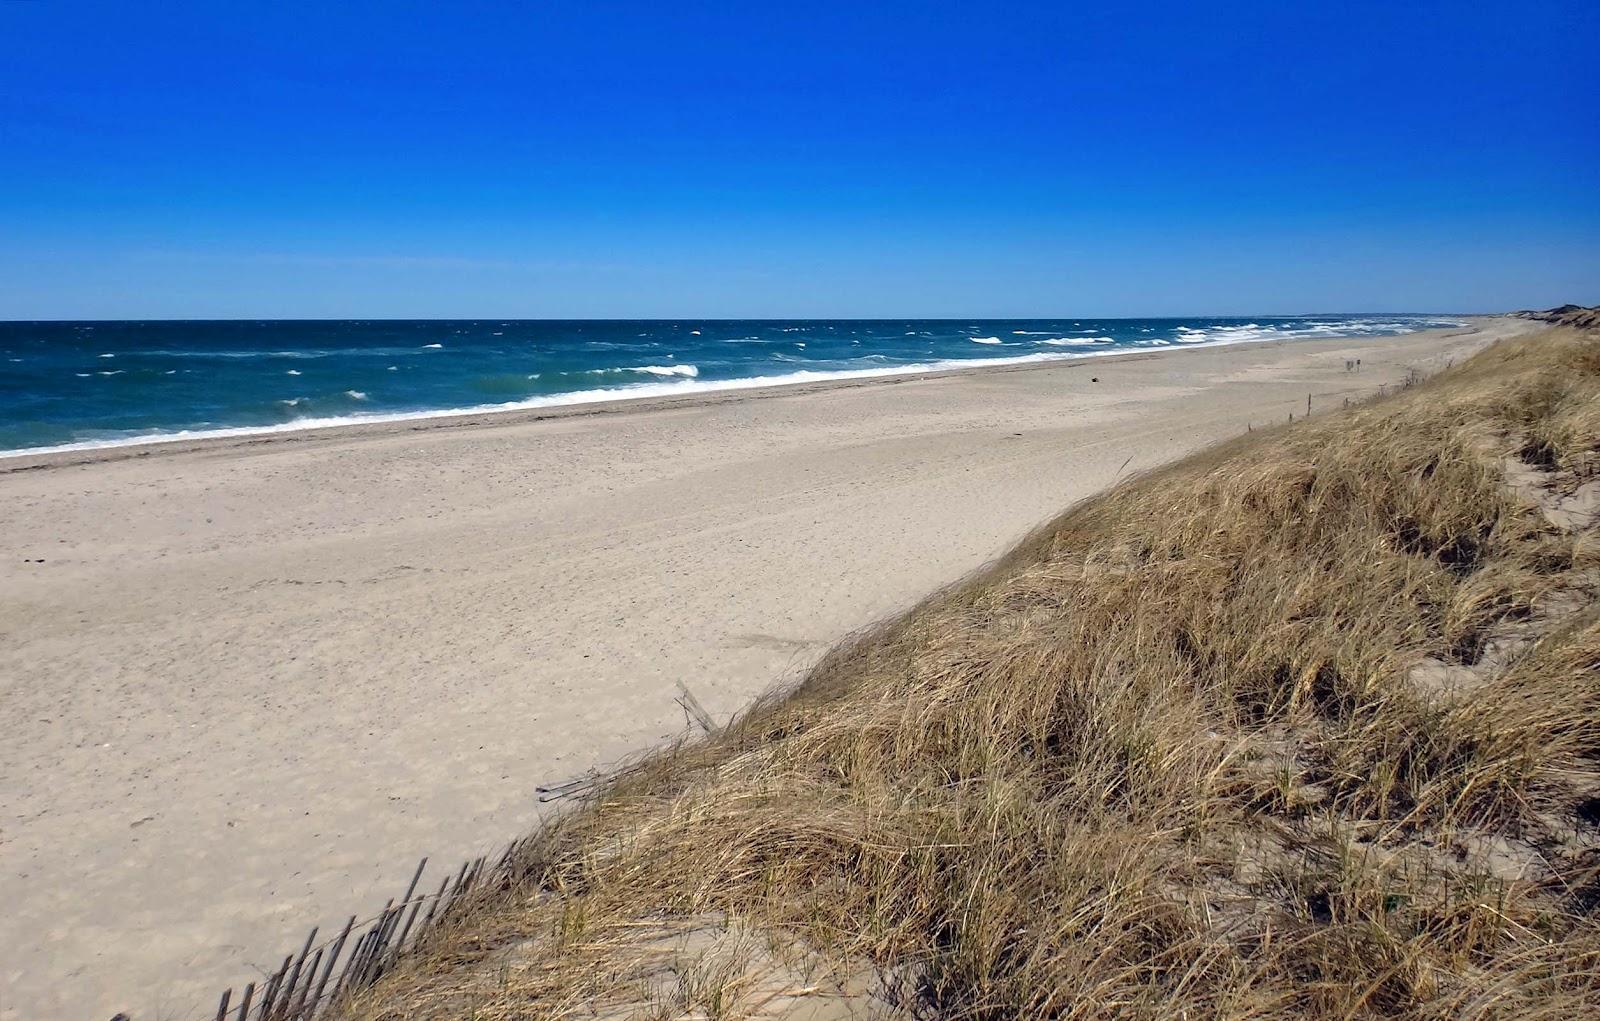 Joe S Retirement Blog Sandy Neck Beach Barnstable Cape